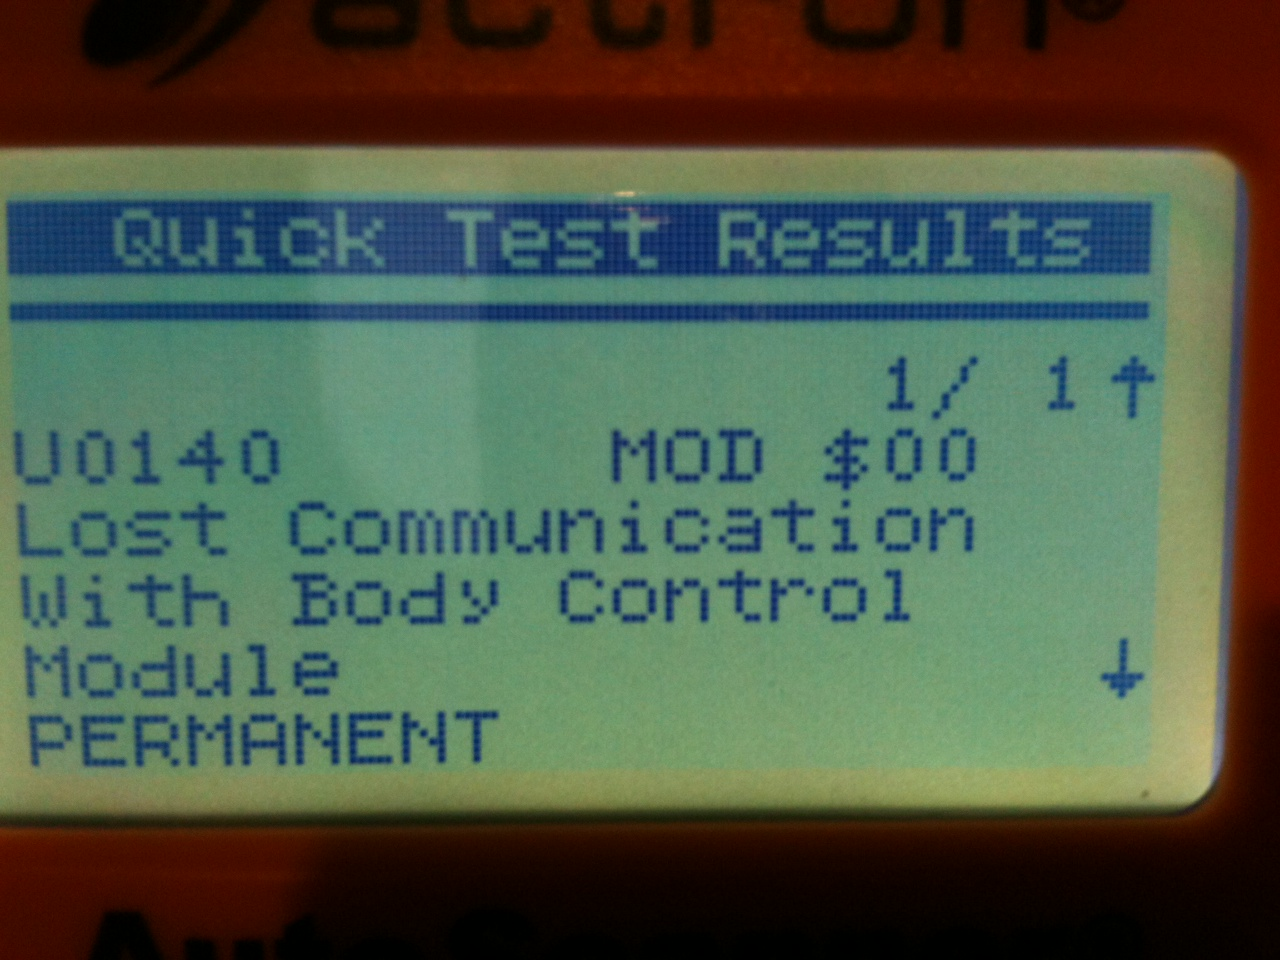 U0140 Lost Com's with BCM ?? | Jeep Garage - Jeep Forum